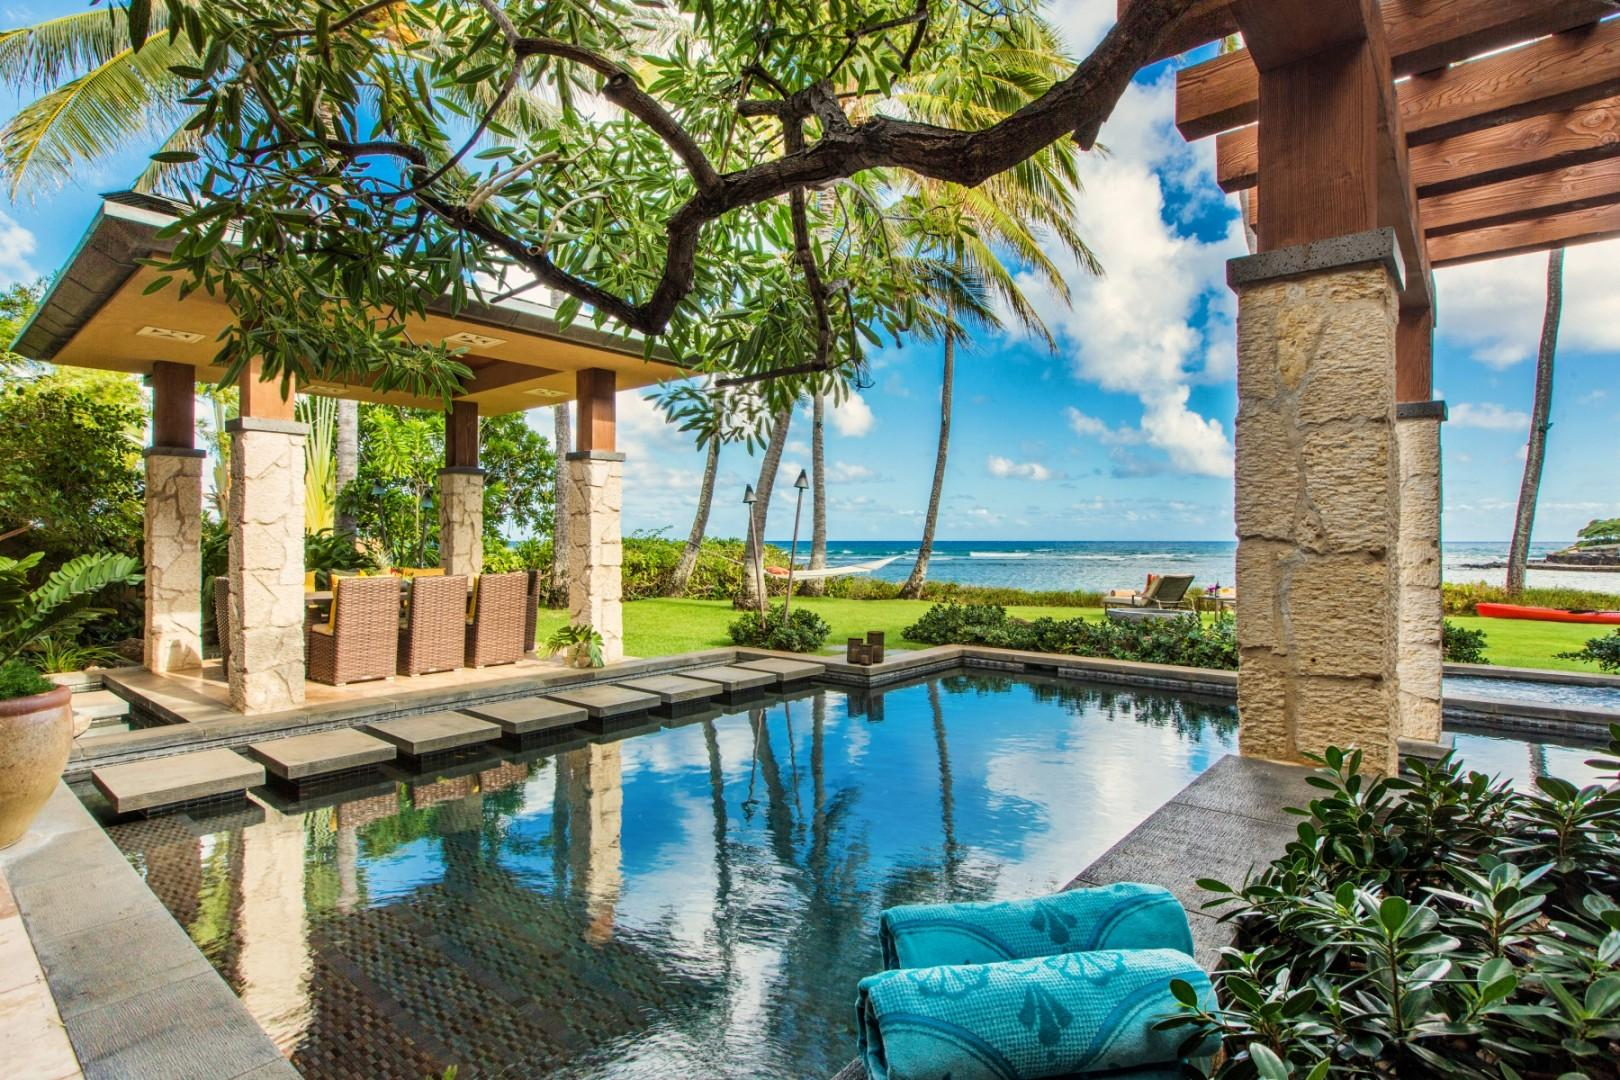 Pool and Cabana toward Ocean